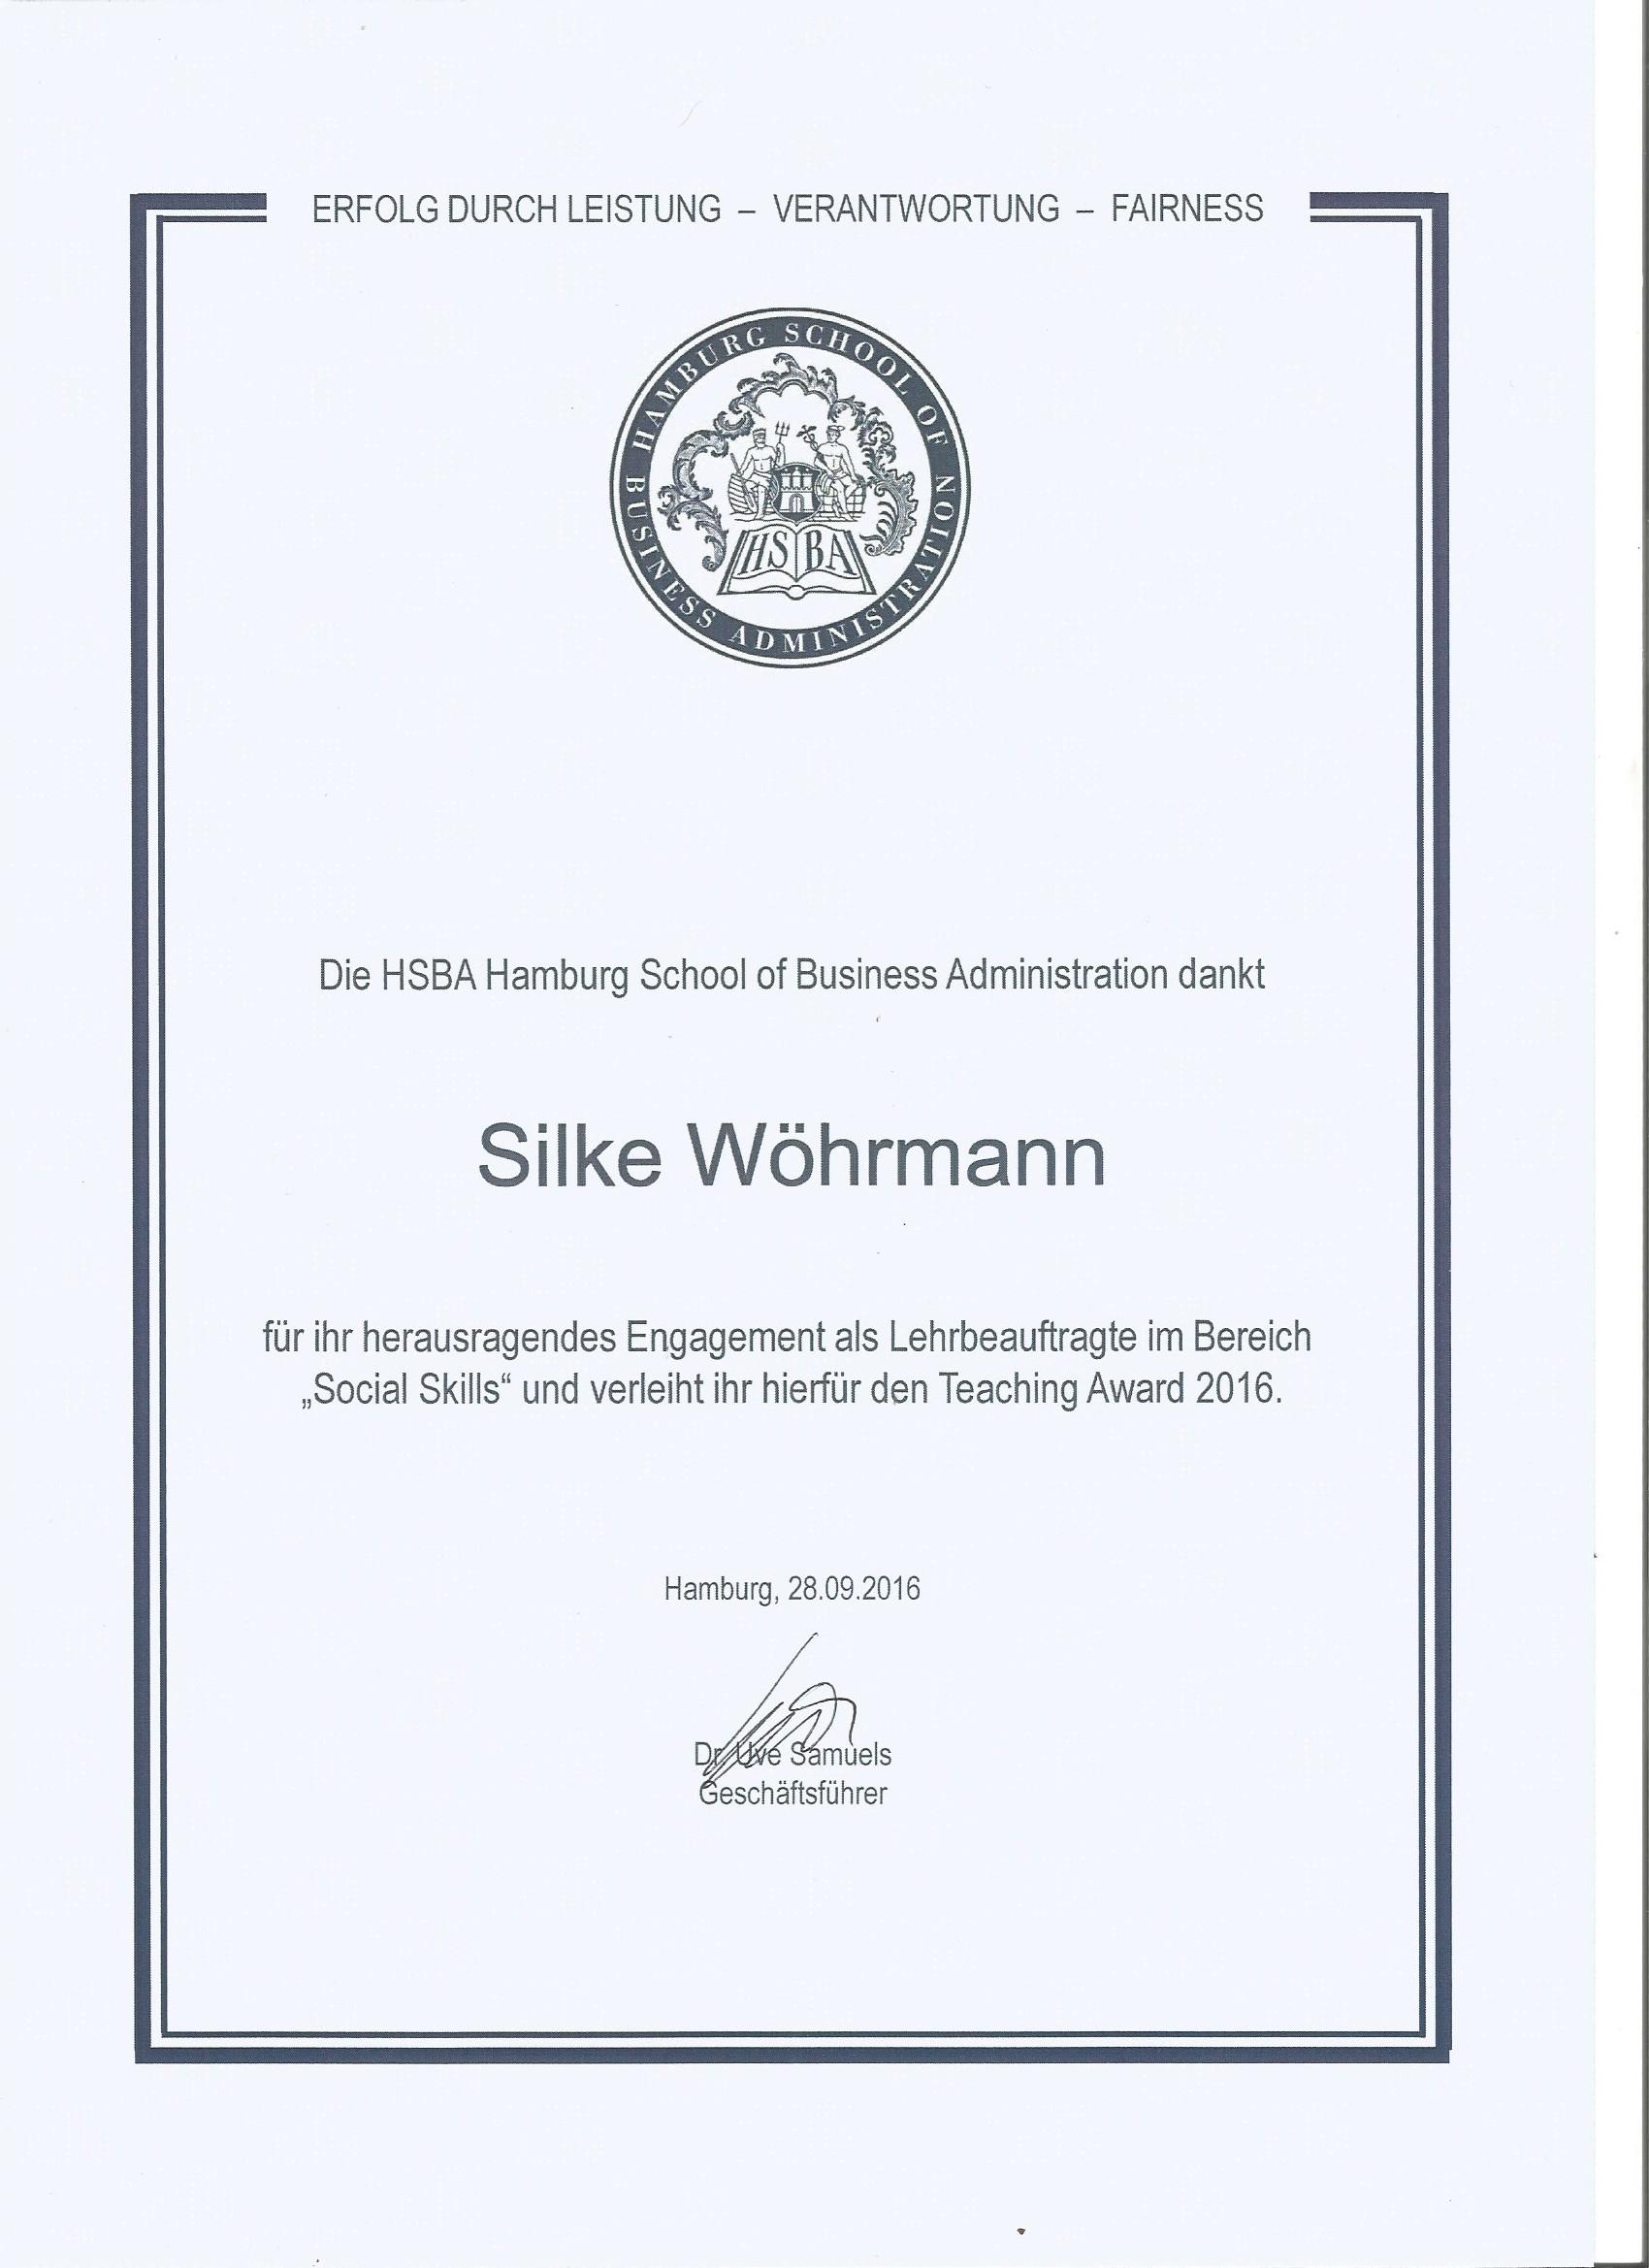 Verleihung Teaching Award Silke Wöhrmann